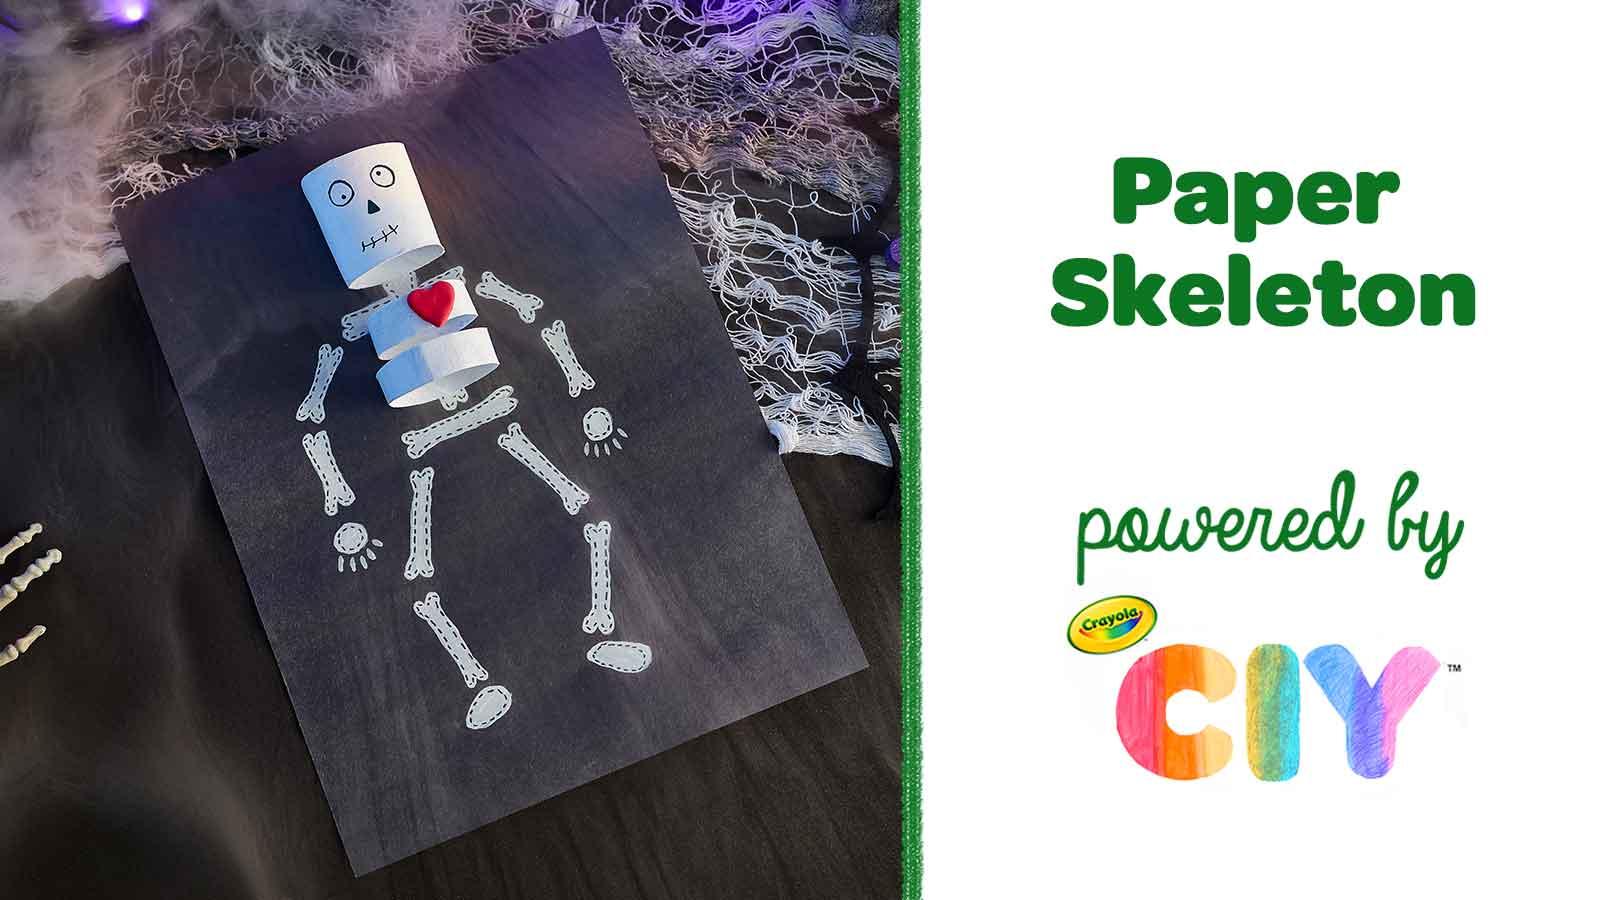 Paper-Skeleton_Poster-Frame